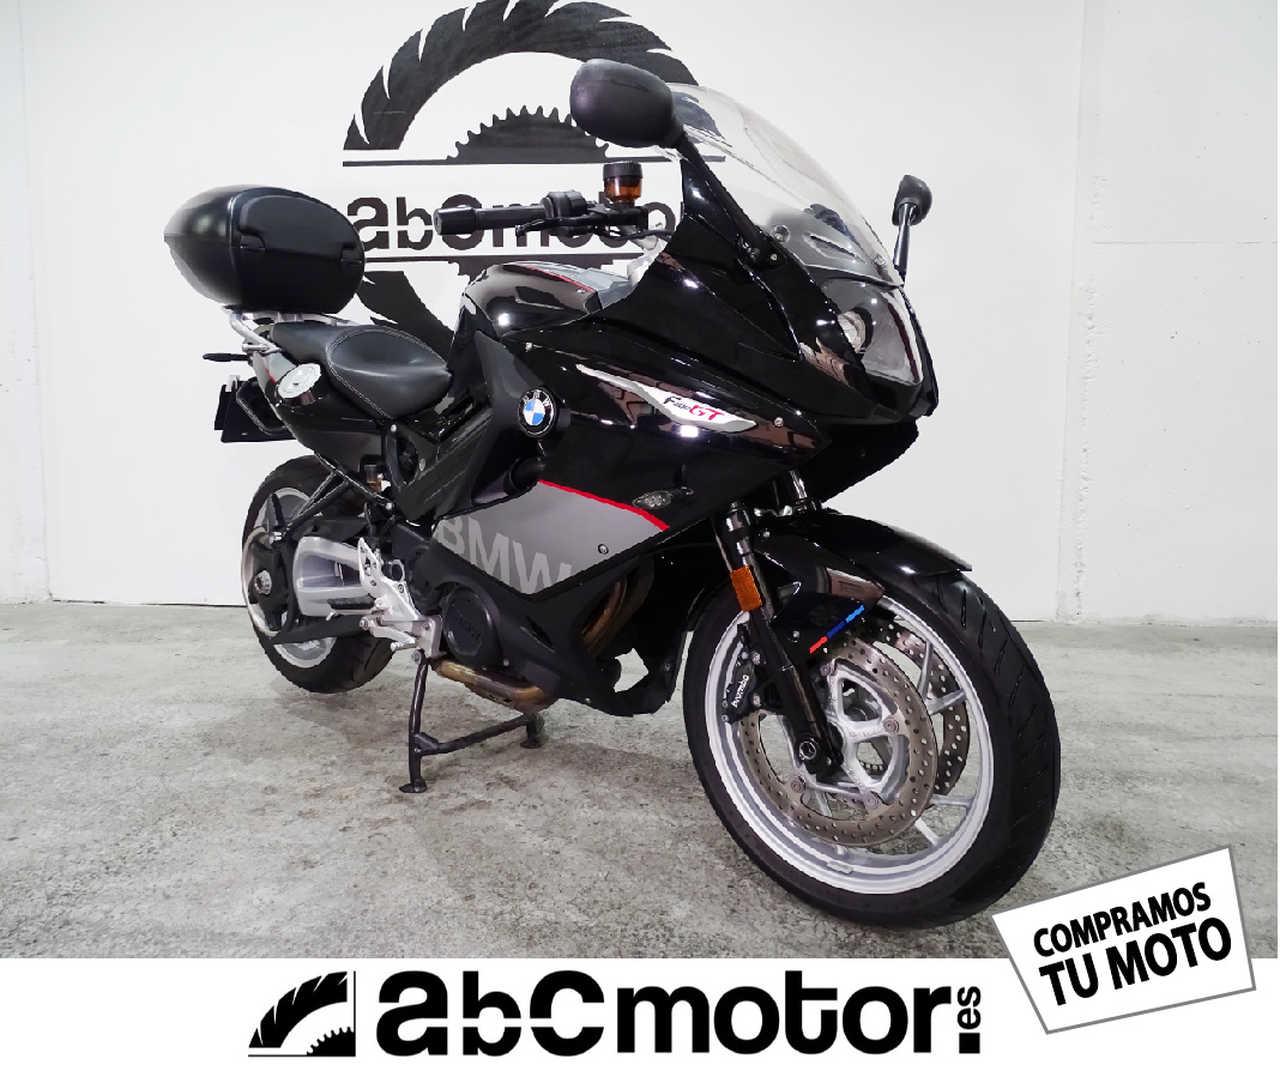 BMW F 800 GT ABS  - Foto 1